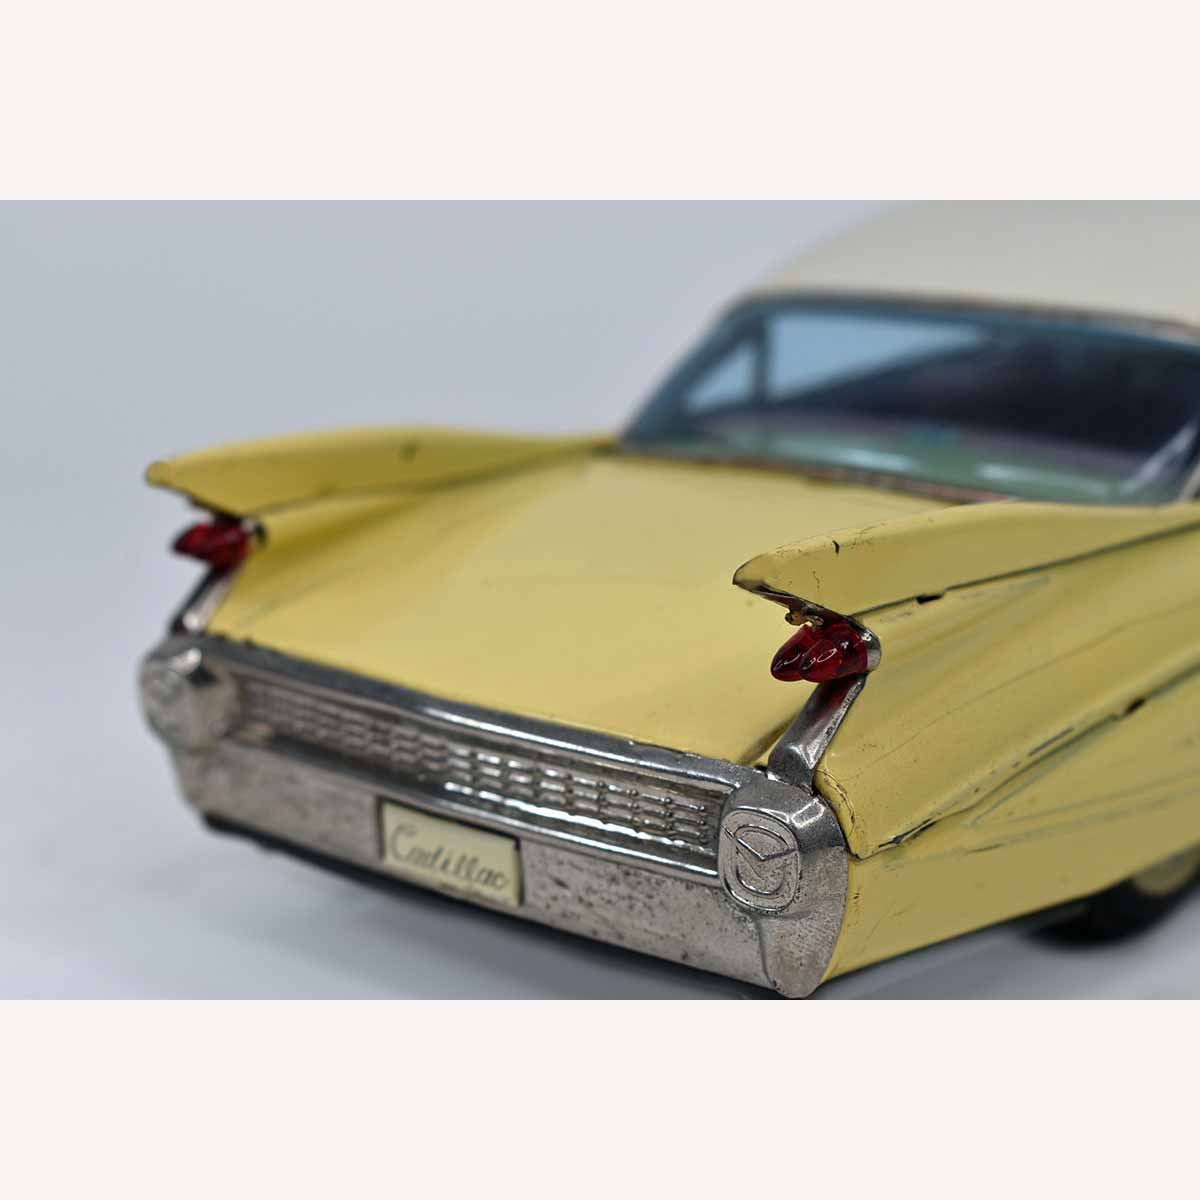 Bandai 1959 Cadillac Tin Friction Automobile TAIL LIGHT SET